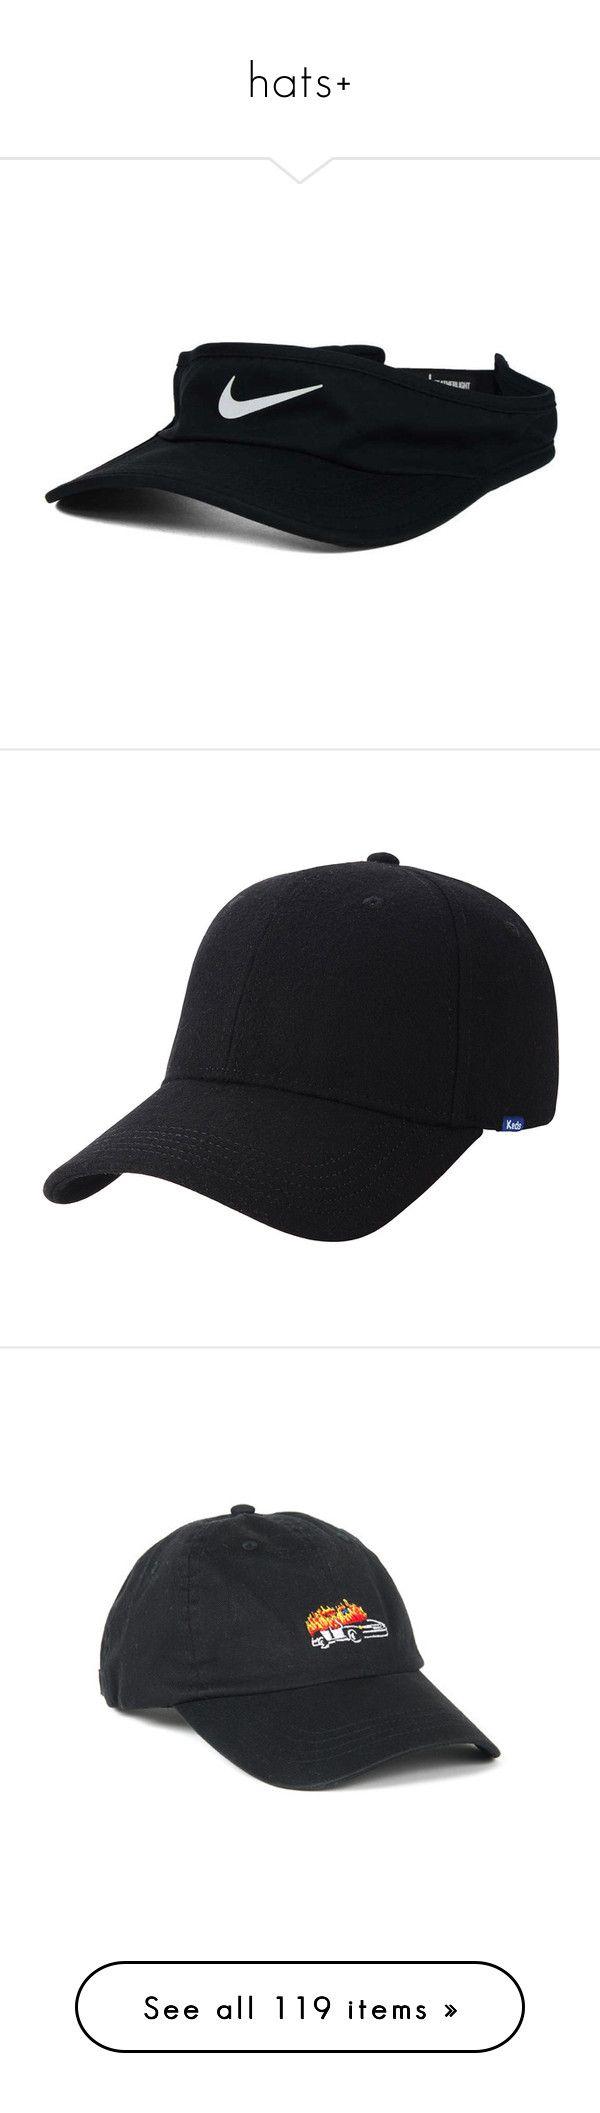 """hats+"" by caylaosuigwe ❤ liked on Polyvore featuring accessories, nike, sun visor, hats, herringbone hat, wool baseball cap, ball cap, adjustable baseball hats, adjustable ball caps and embroidered hats"